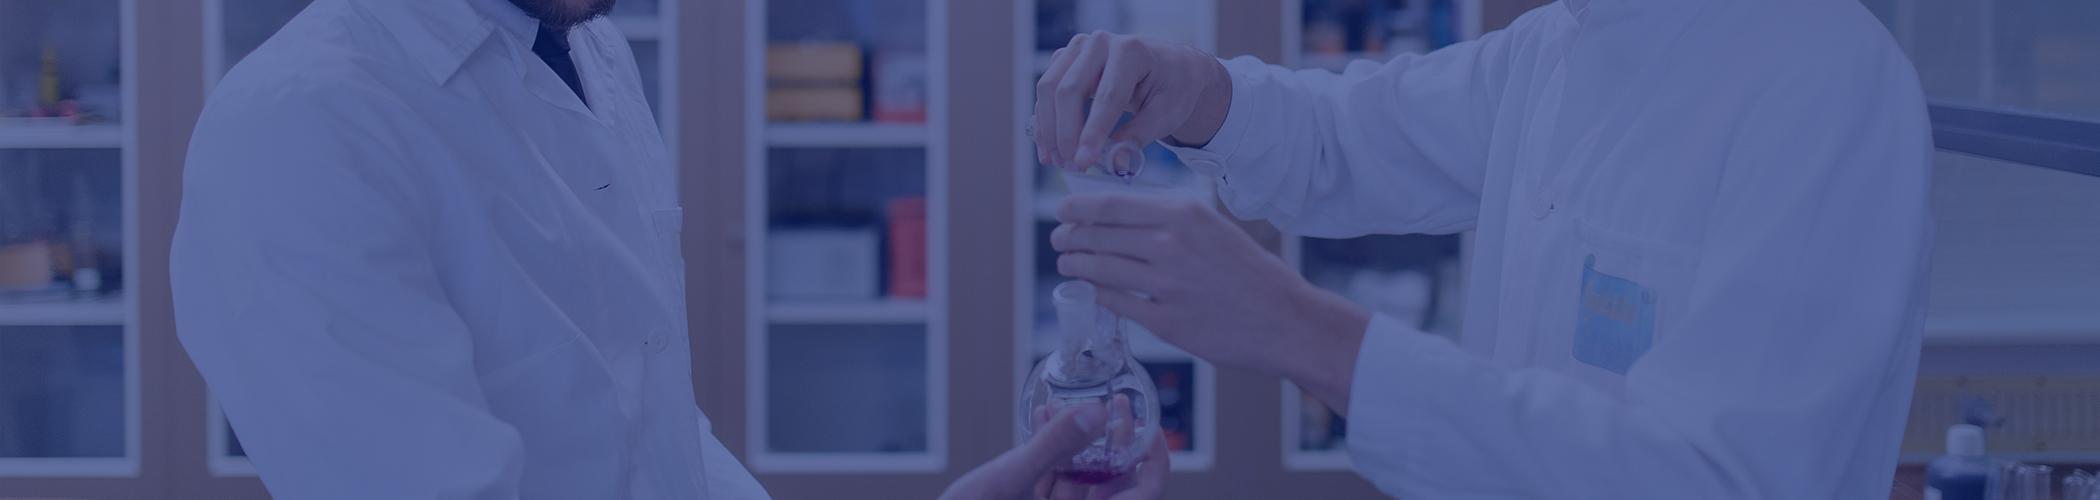 Zwei Schüler im Chemieunterricht.